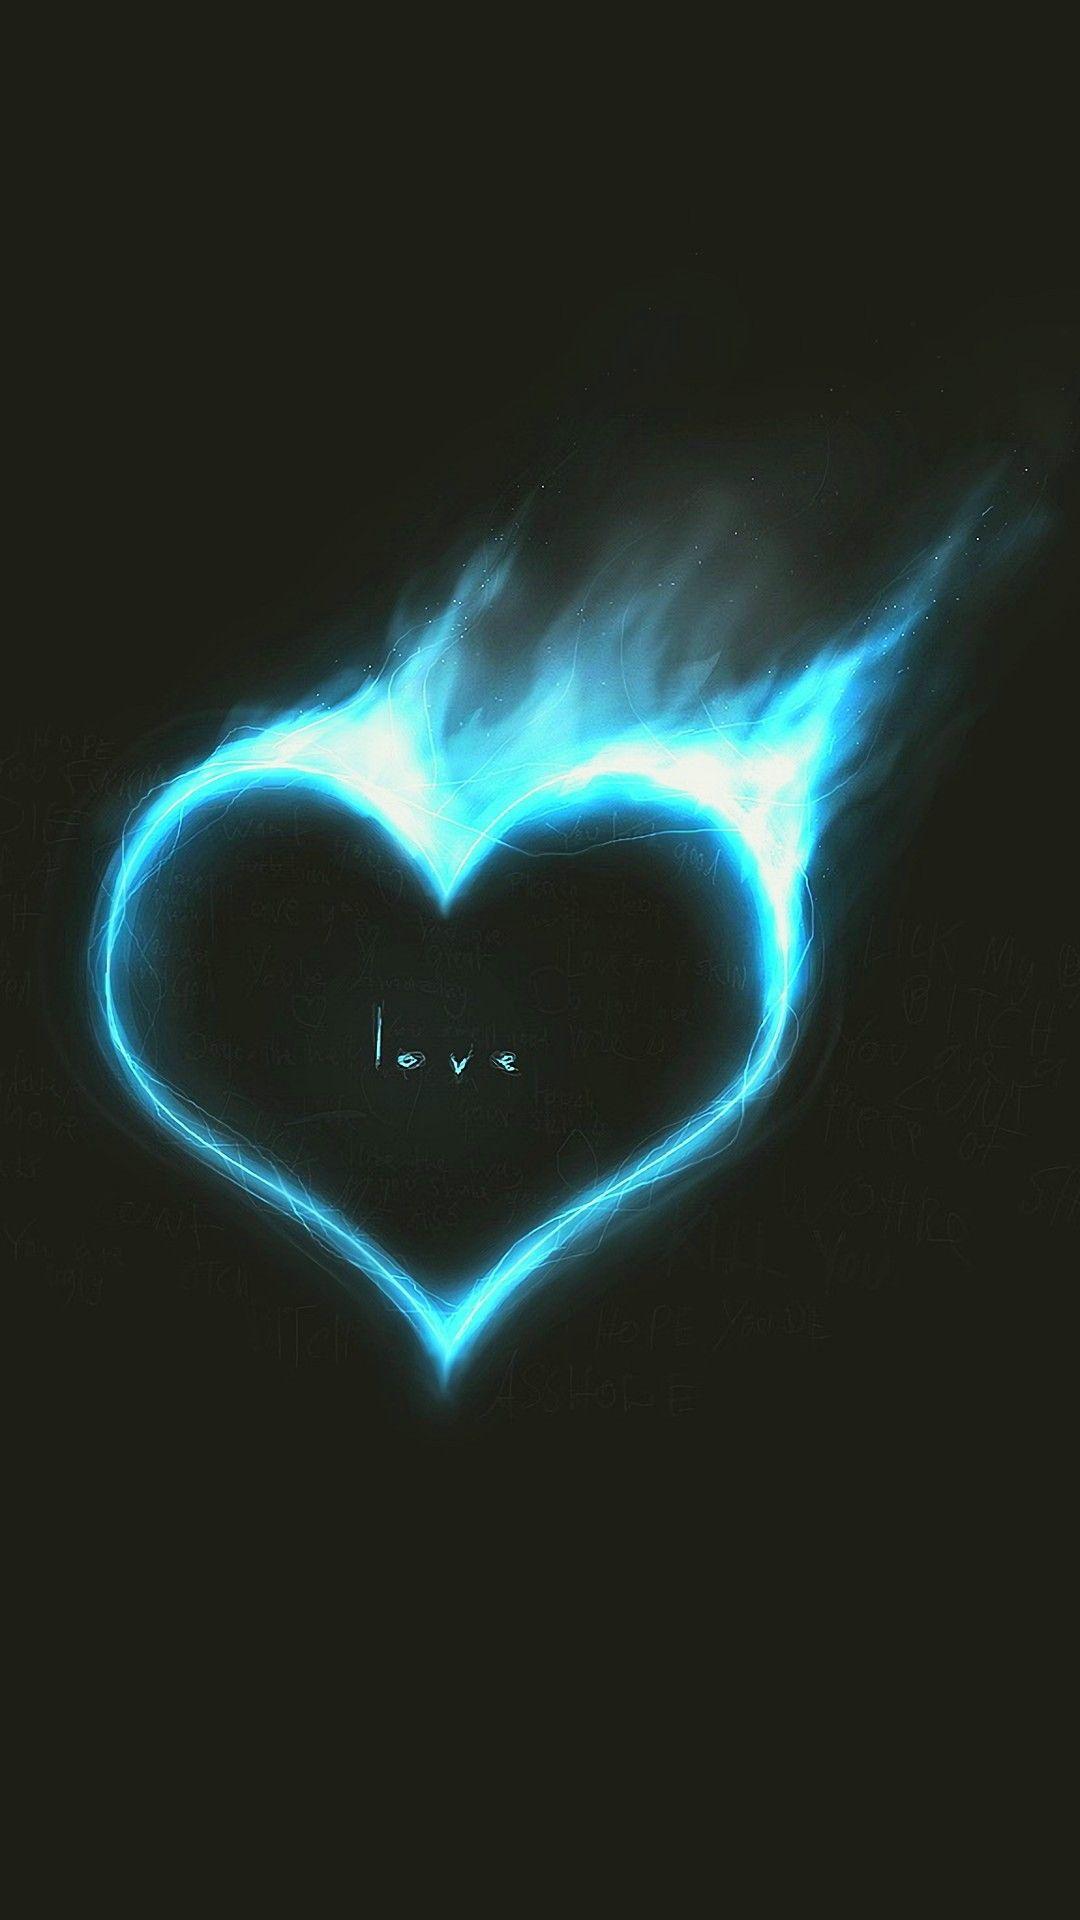 Blue Heart Cool Black LG V60 ThinQ 5G Power Saving HD Wallpapers